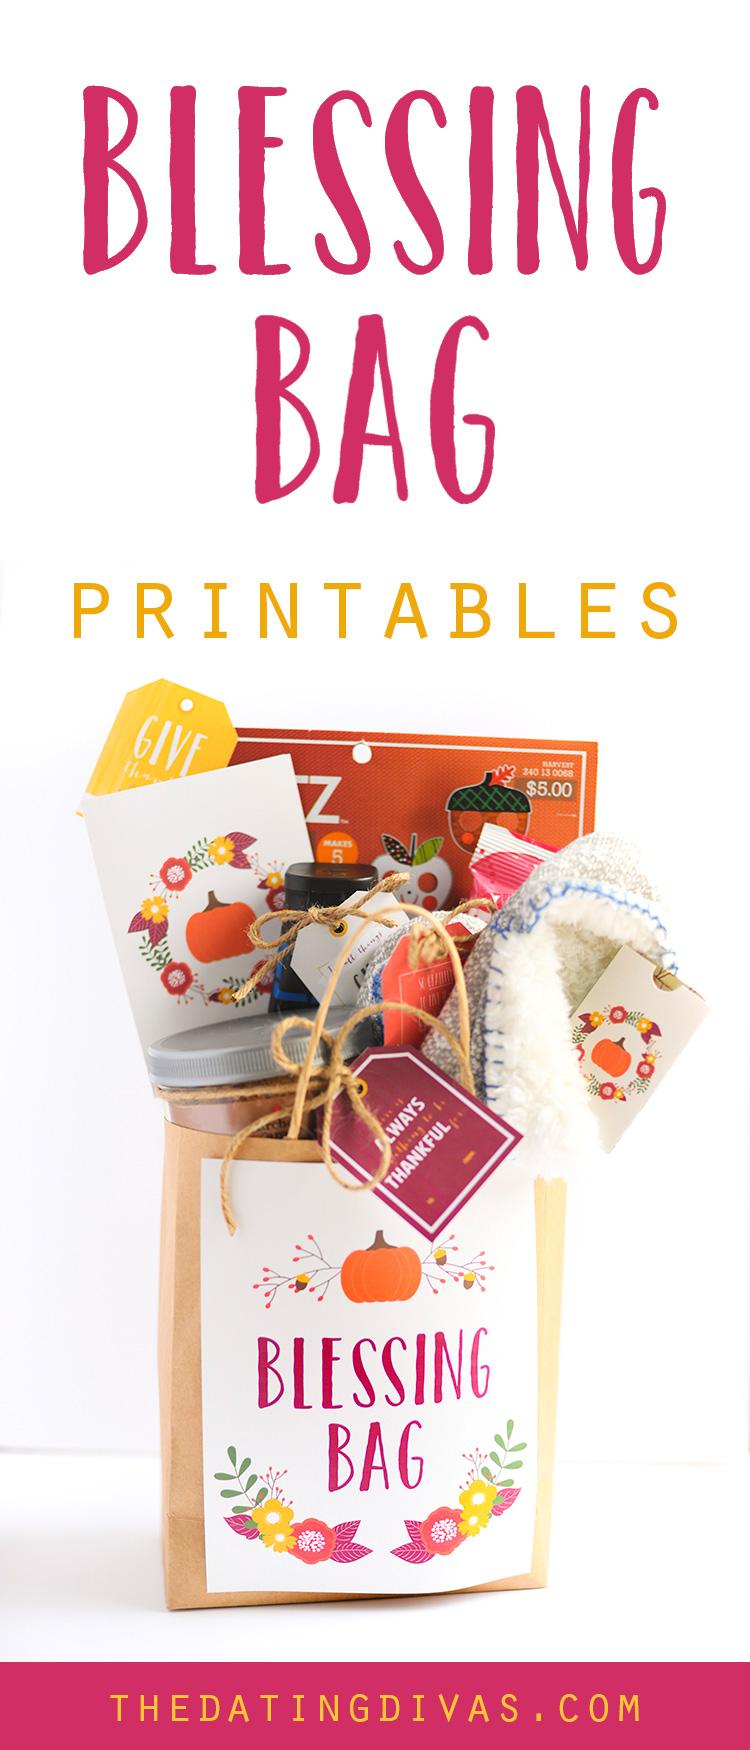 Blessing Bag Printables